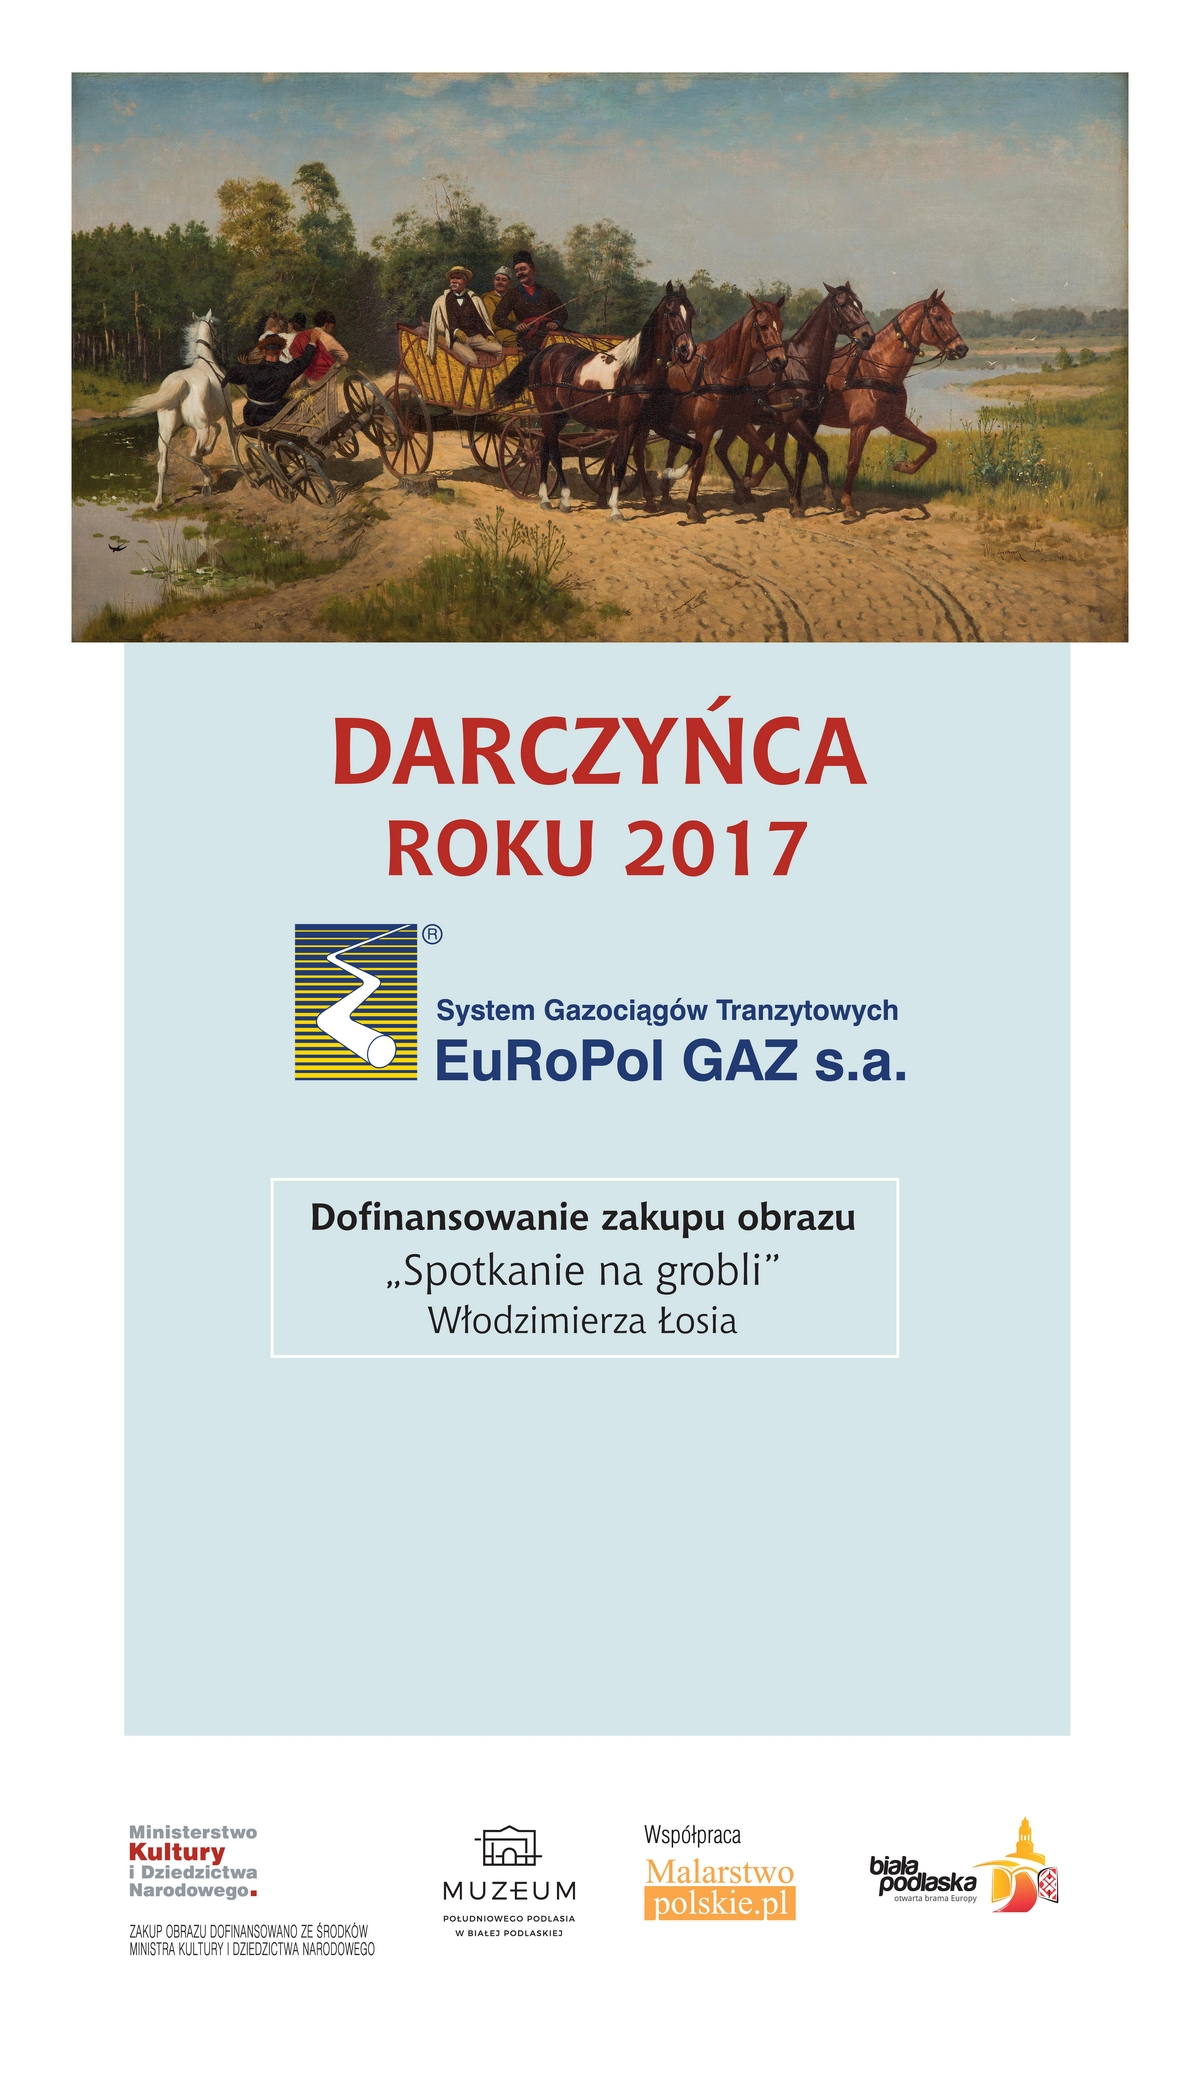 Darczynca roku 2017